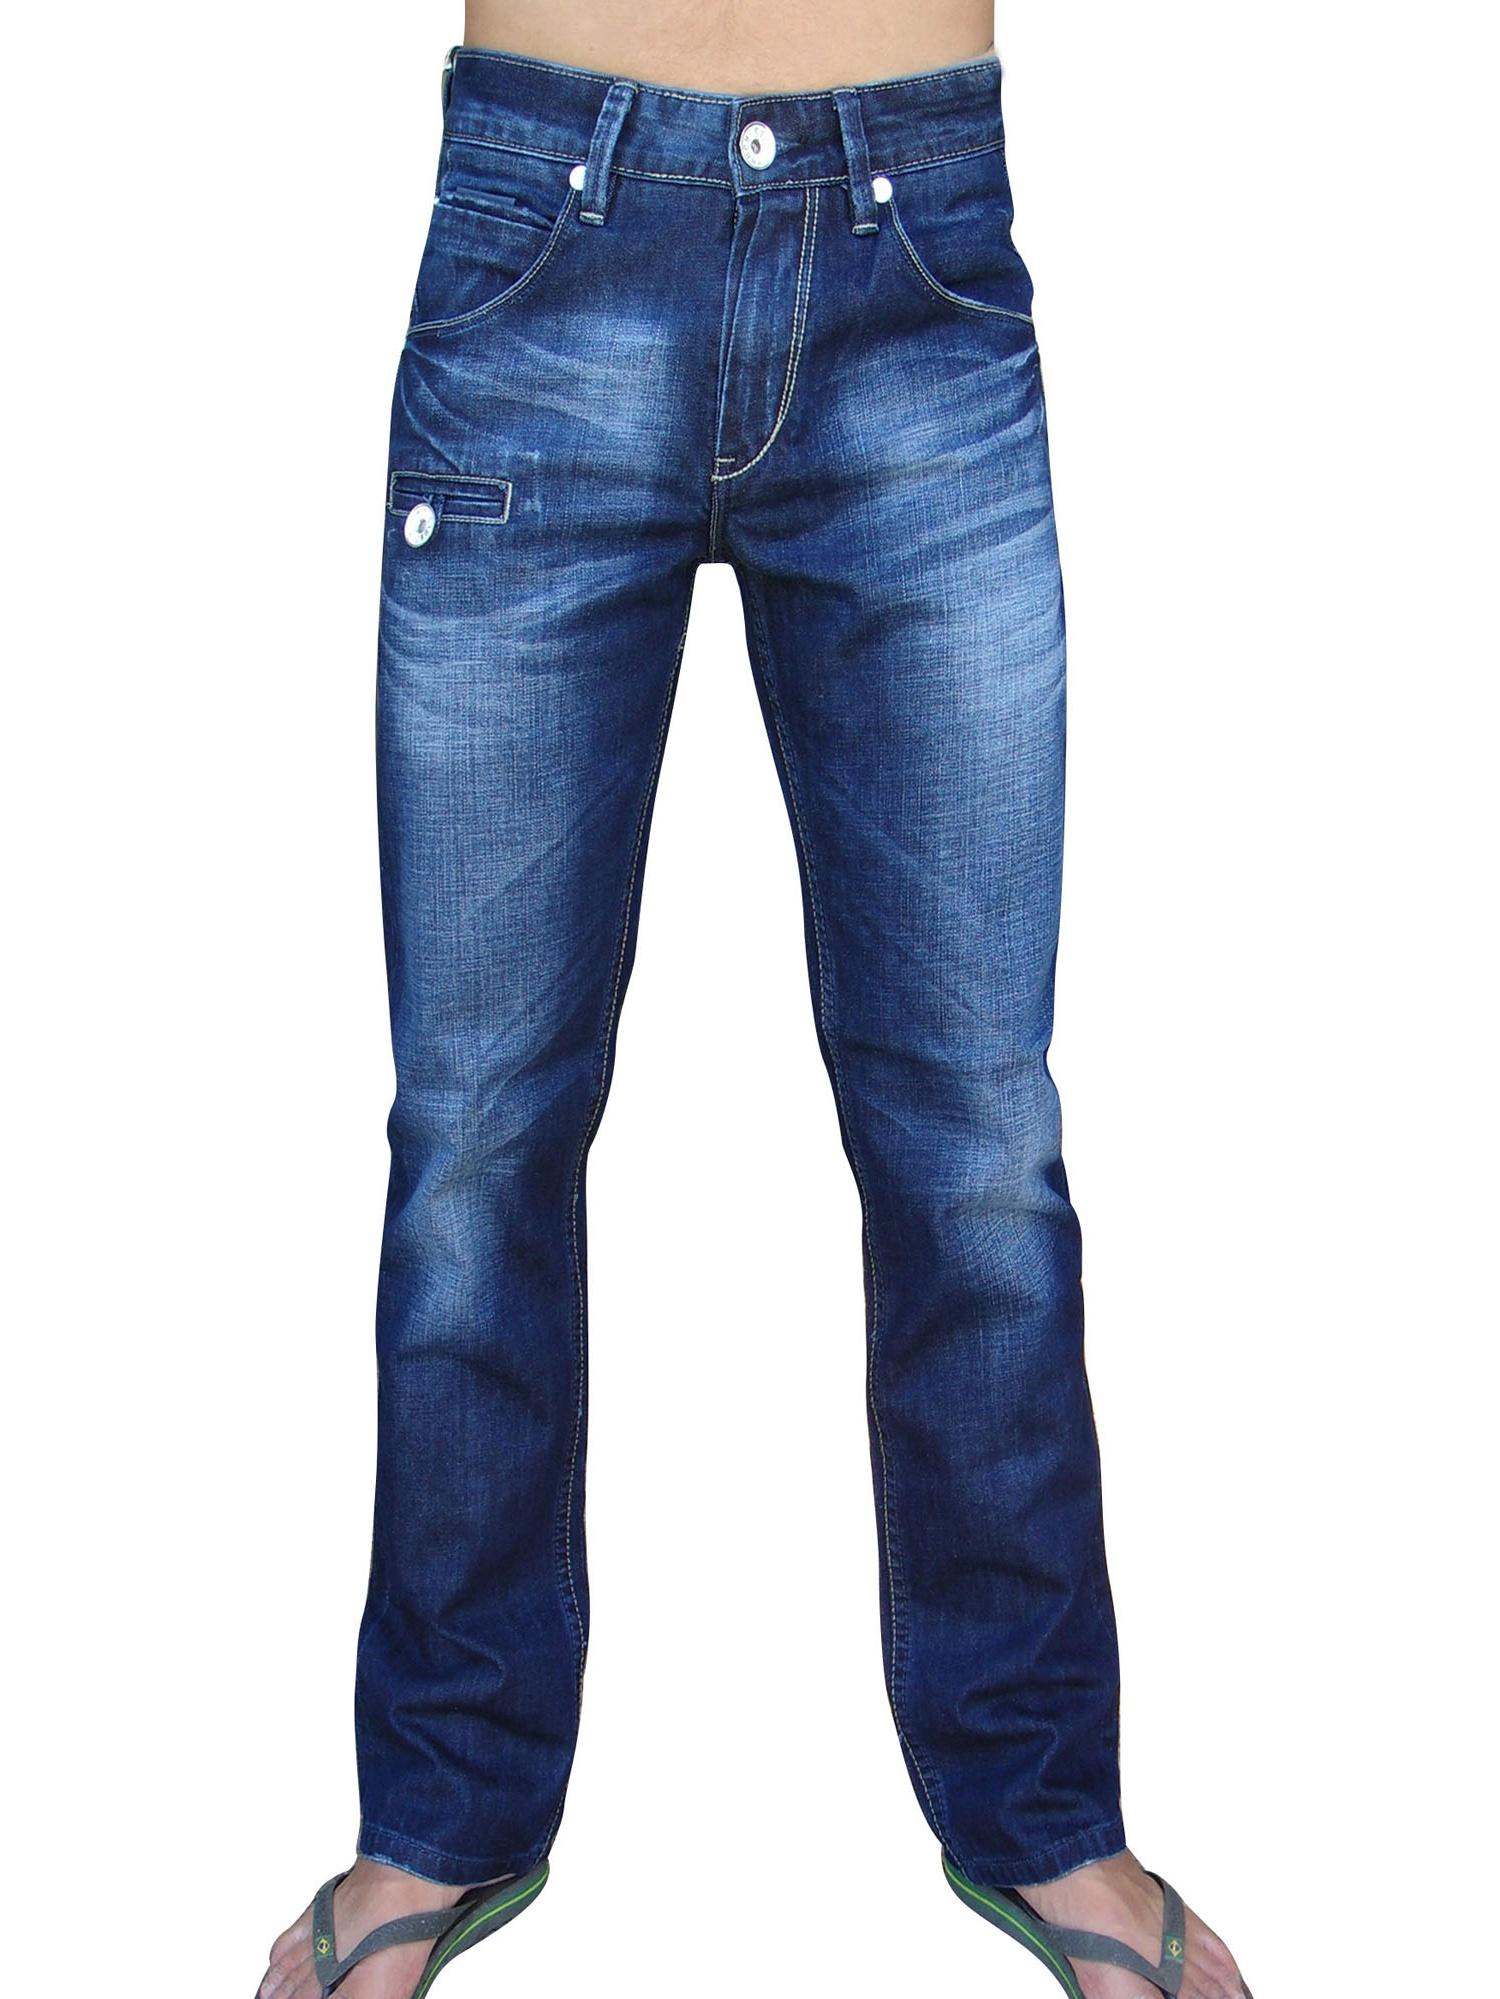 StoneTouch Men's Regular Fit Jeans 306-30s